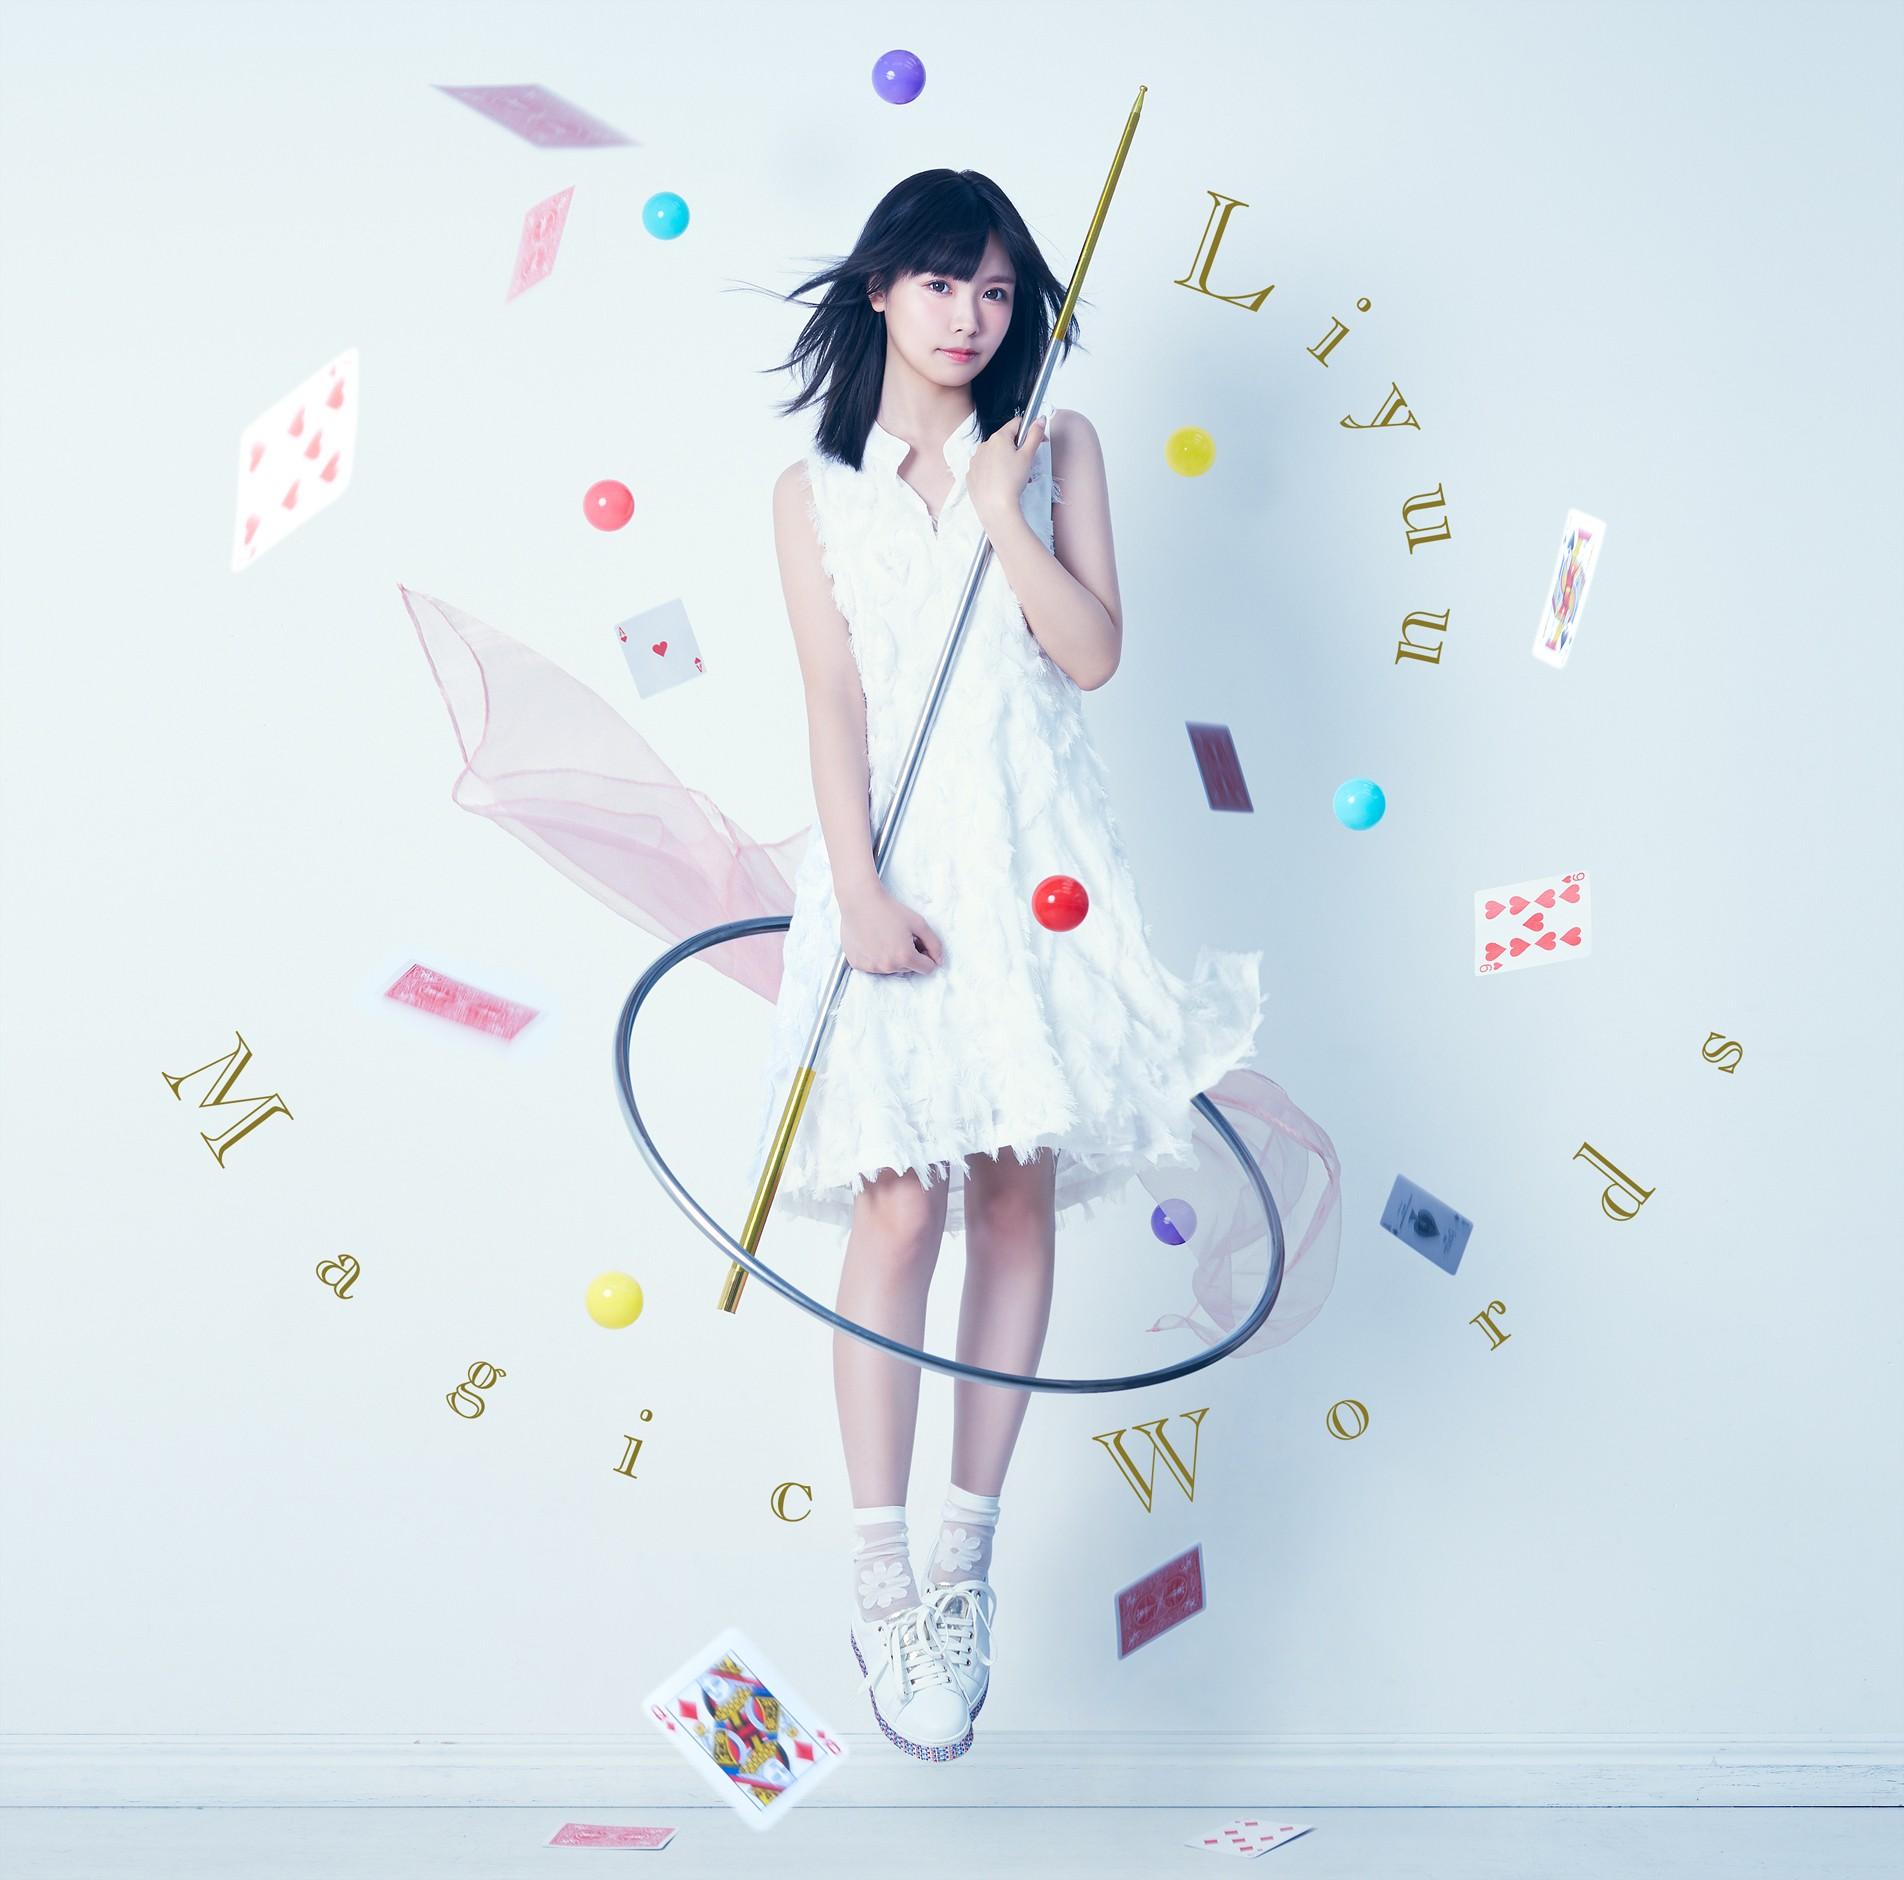 [Single] Liyuu – Magic Words [FLAC / 24bit Lossless / WEB] [2020.01.22]